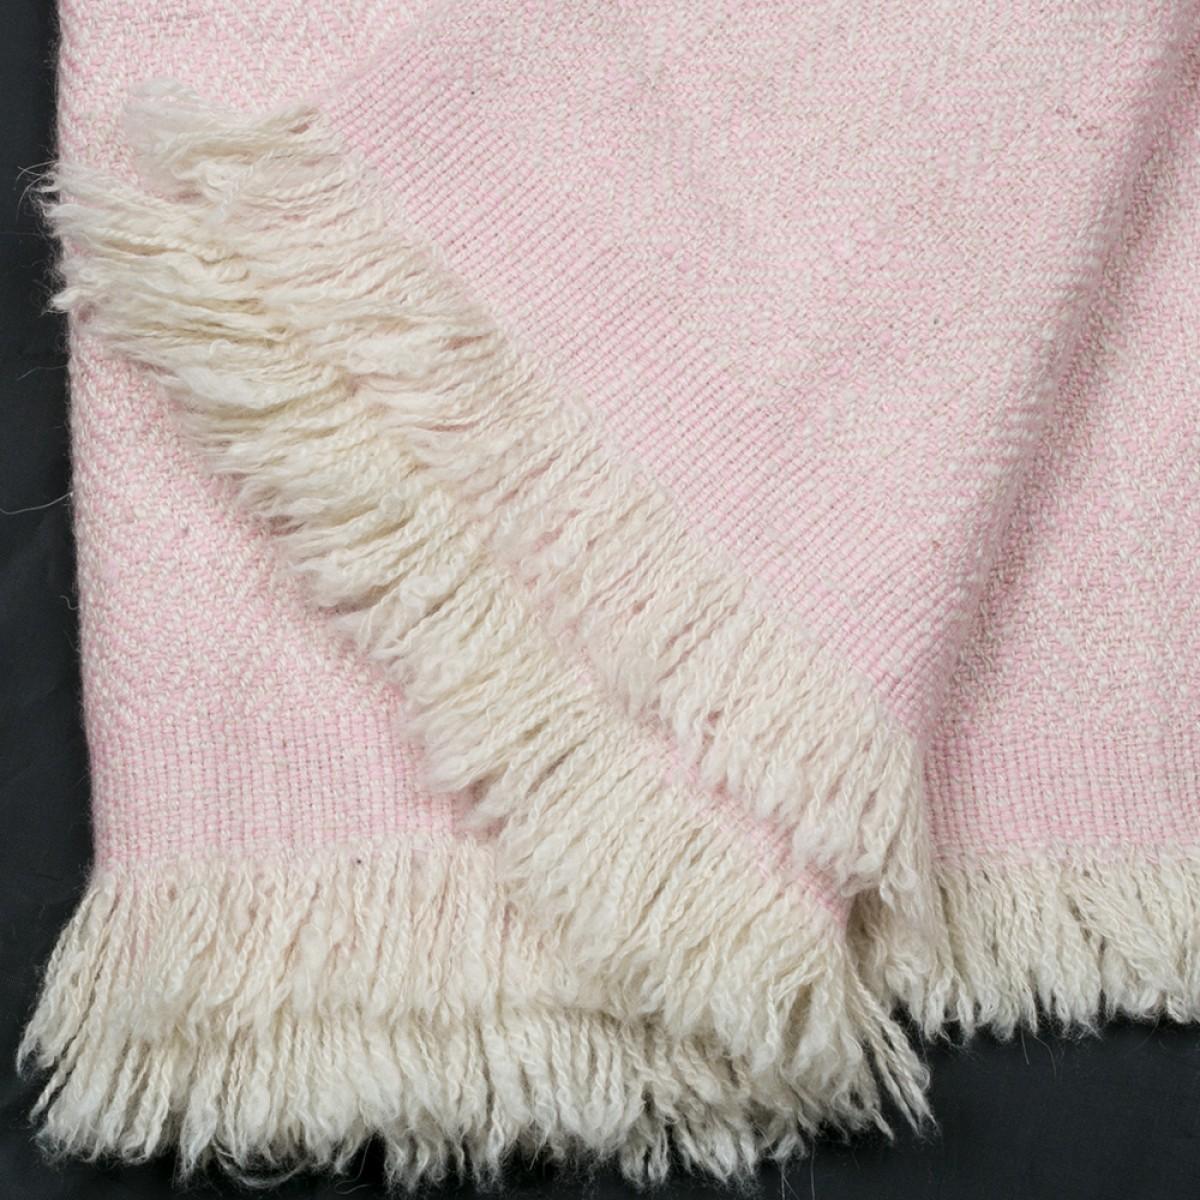 Baby Pink Herringbone Weave Baby Cashmere Blanket